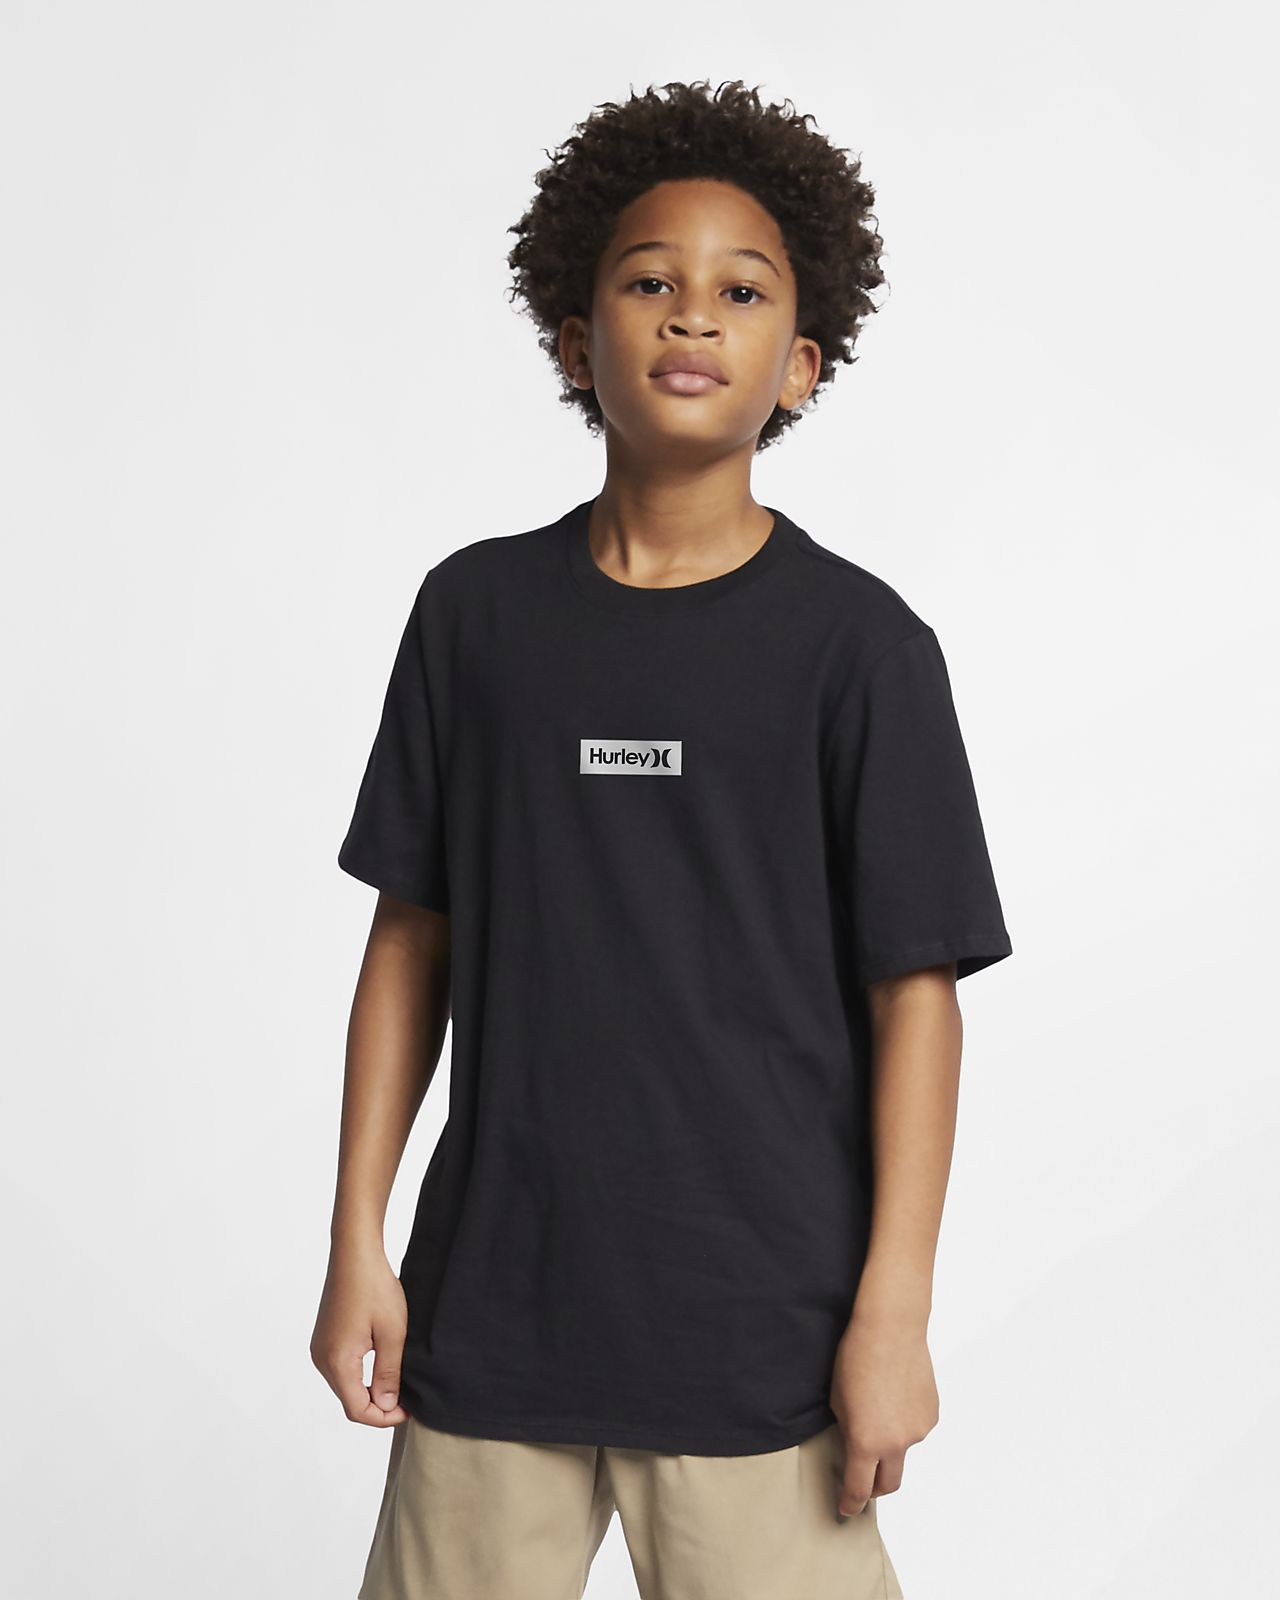 T-shirt Hurley Premium One And Only Small Box för killar